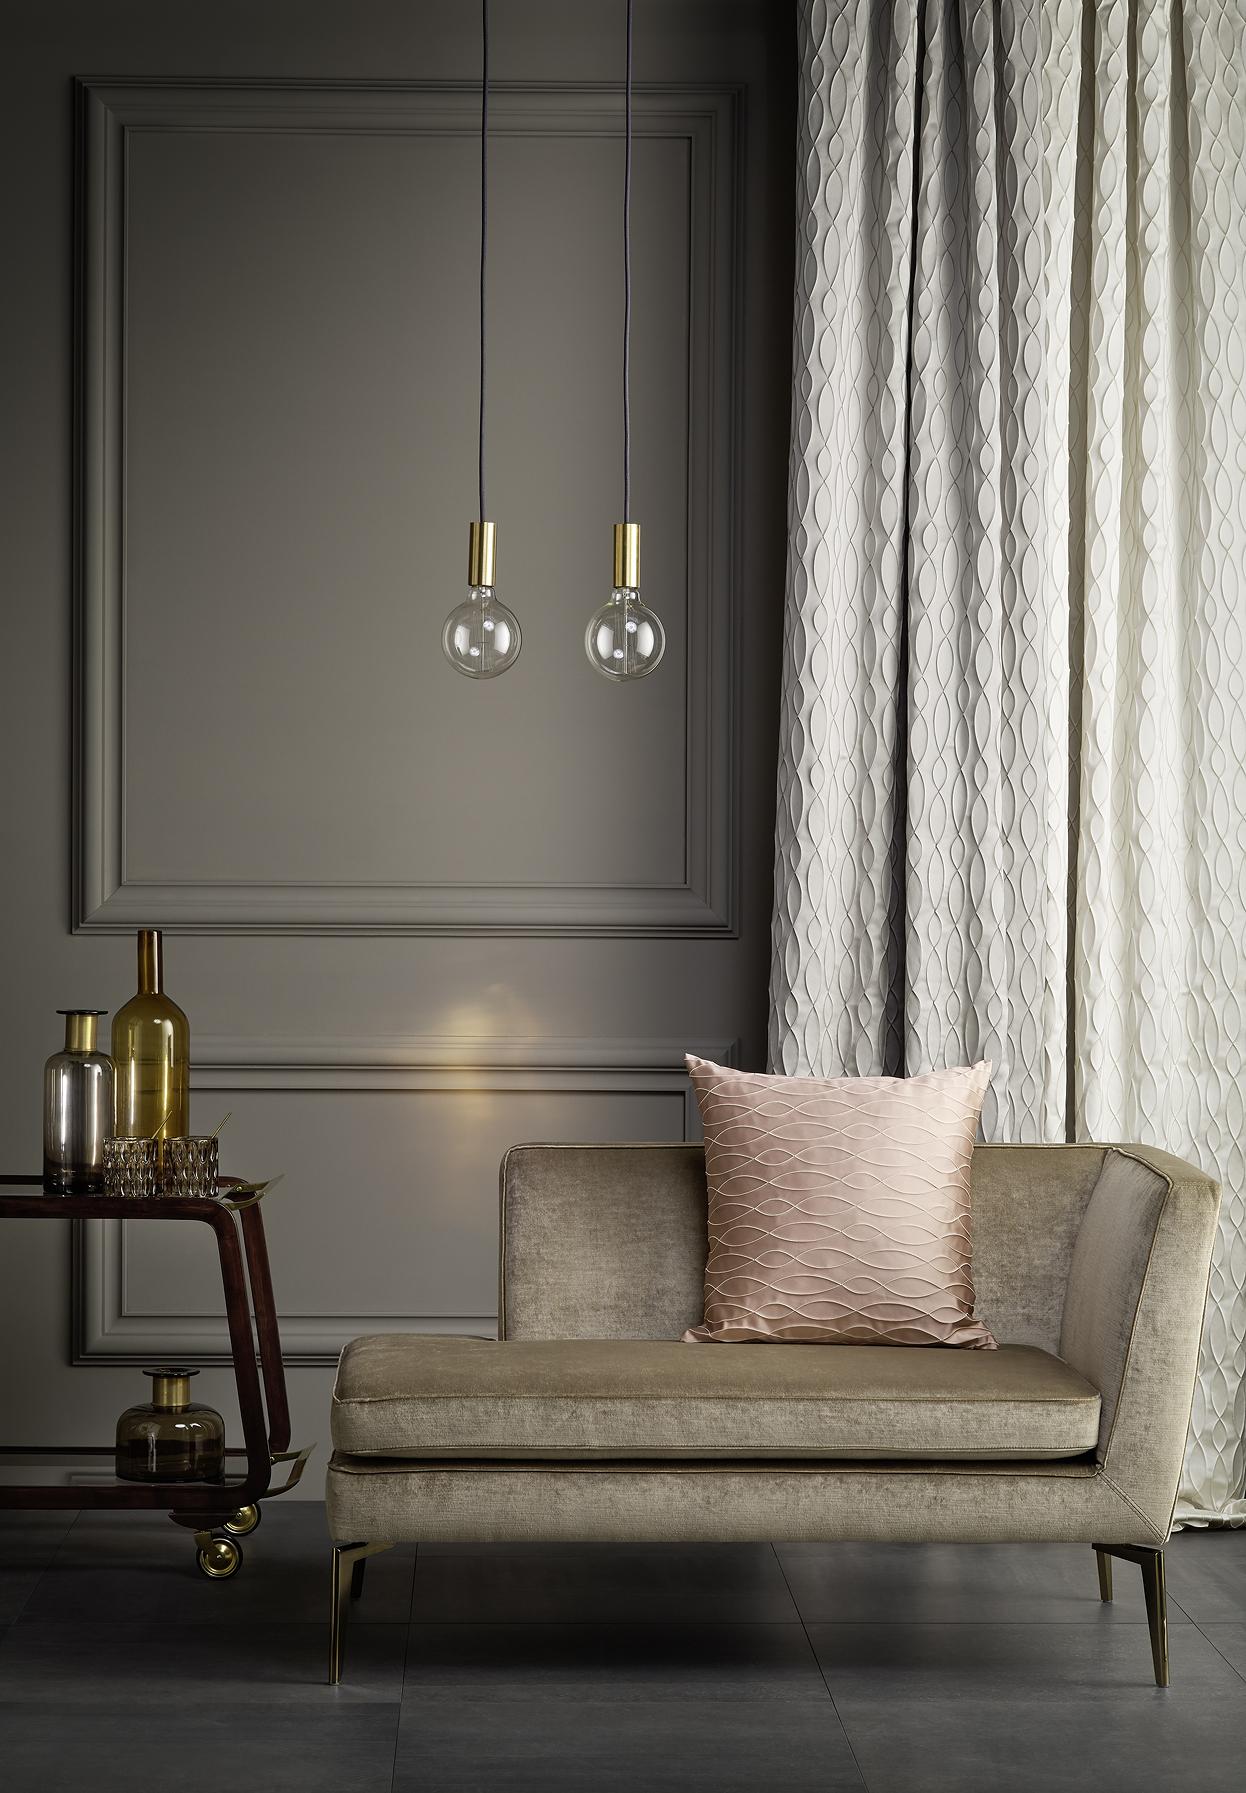 textile opulenz f r gl nzende herbst aussichten. Black Bedroom Furniture Sets. Home Design Ideas